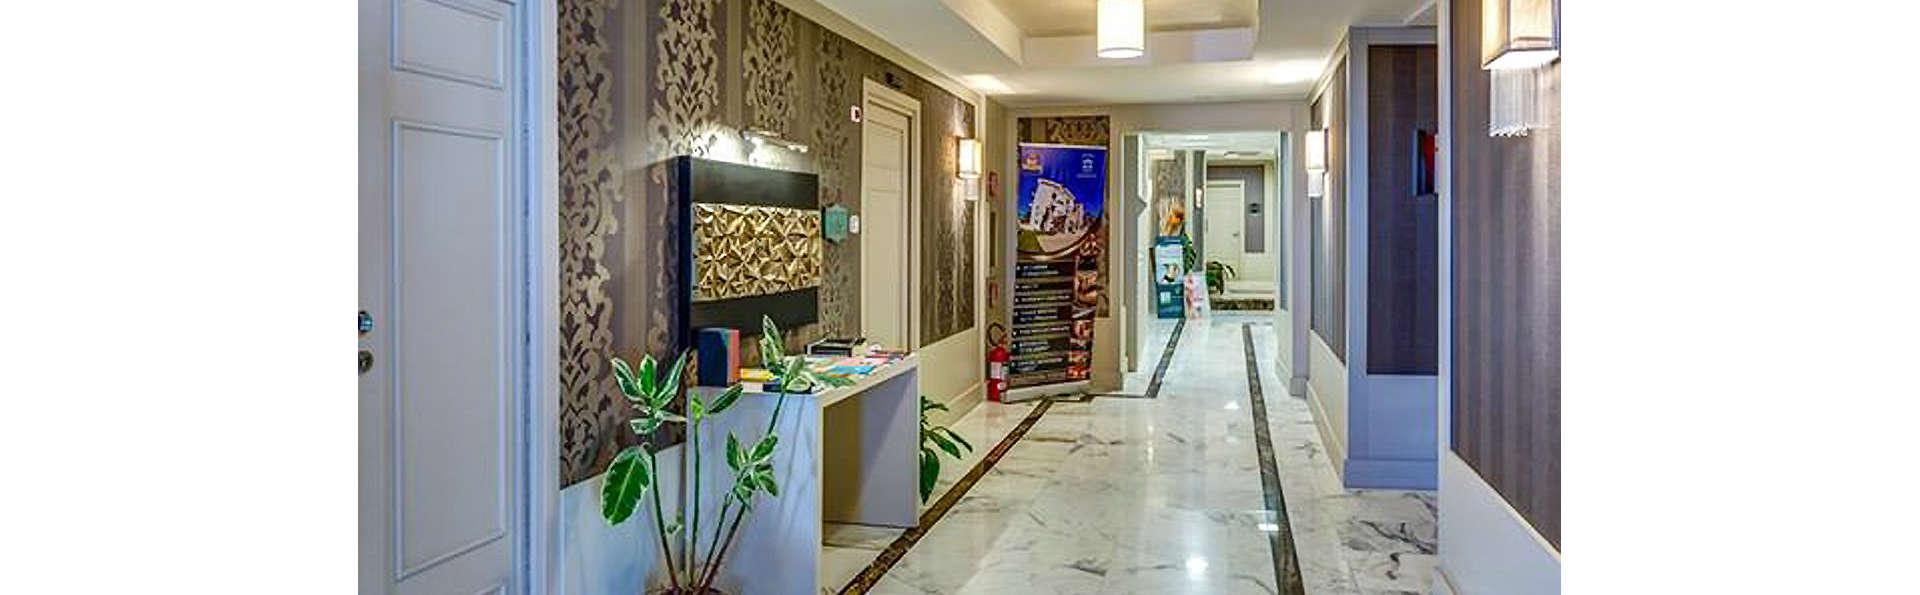 Best Western Plus Hotel Perla Del Porto - EDIT_HALL_01.jpg